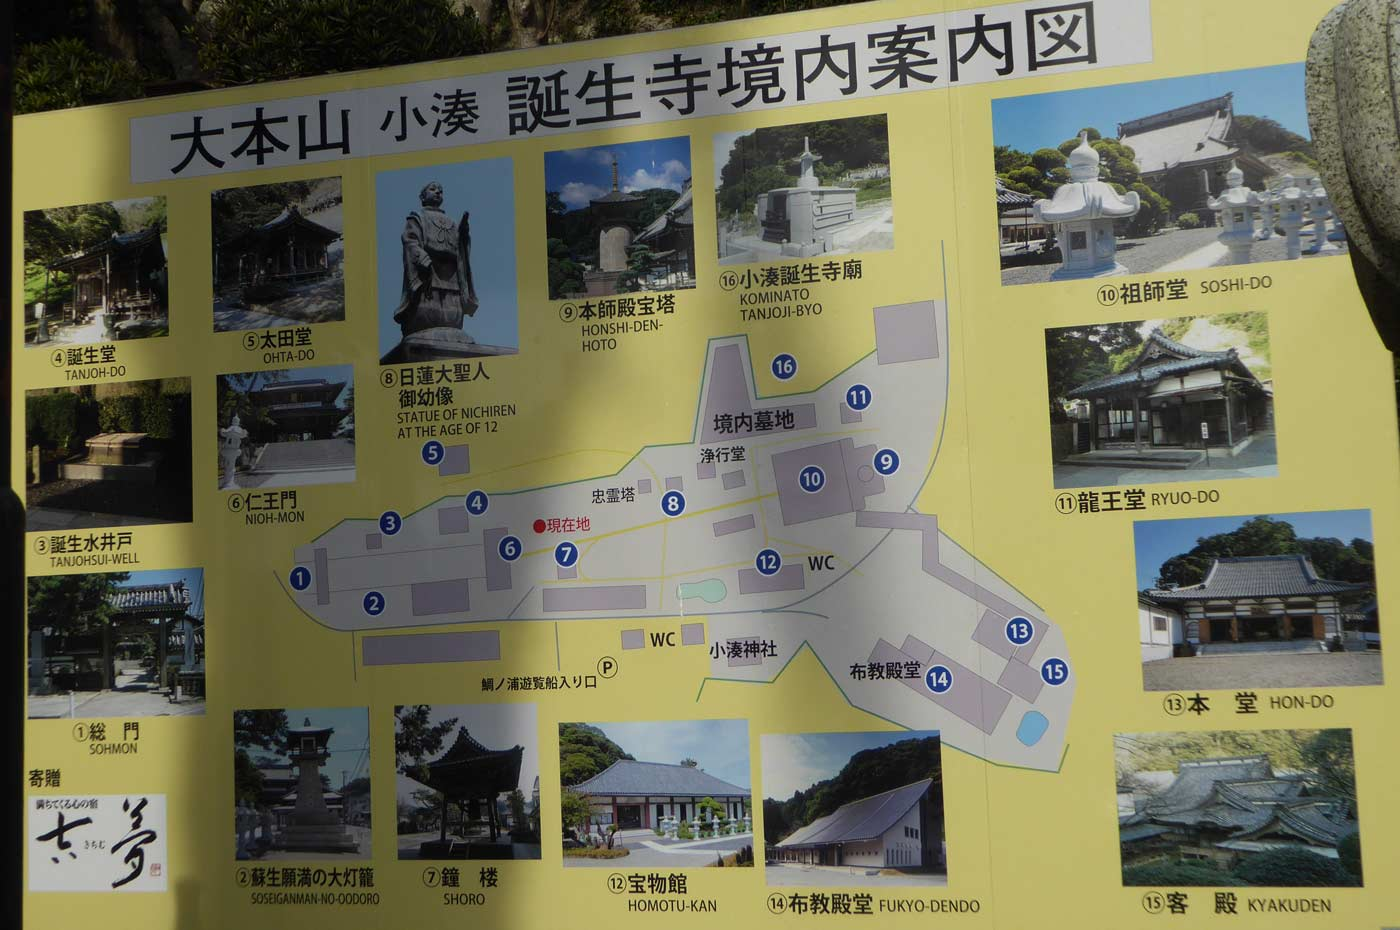 誕生寺案内板の画像